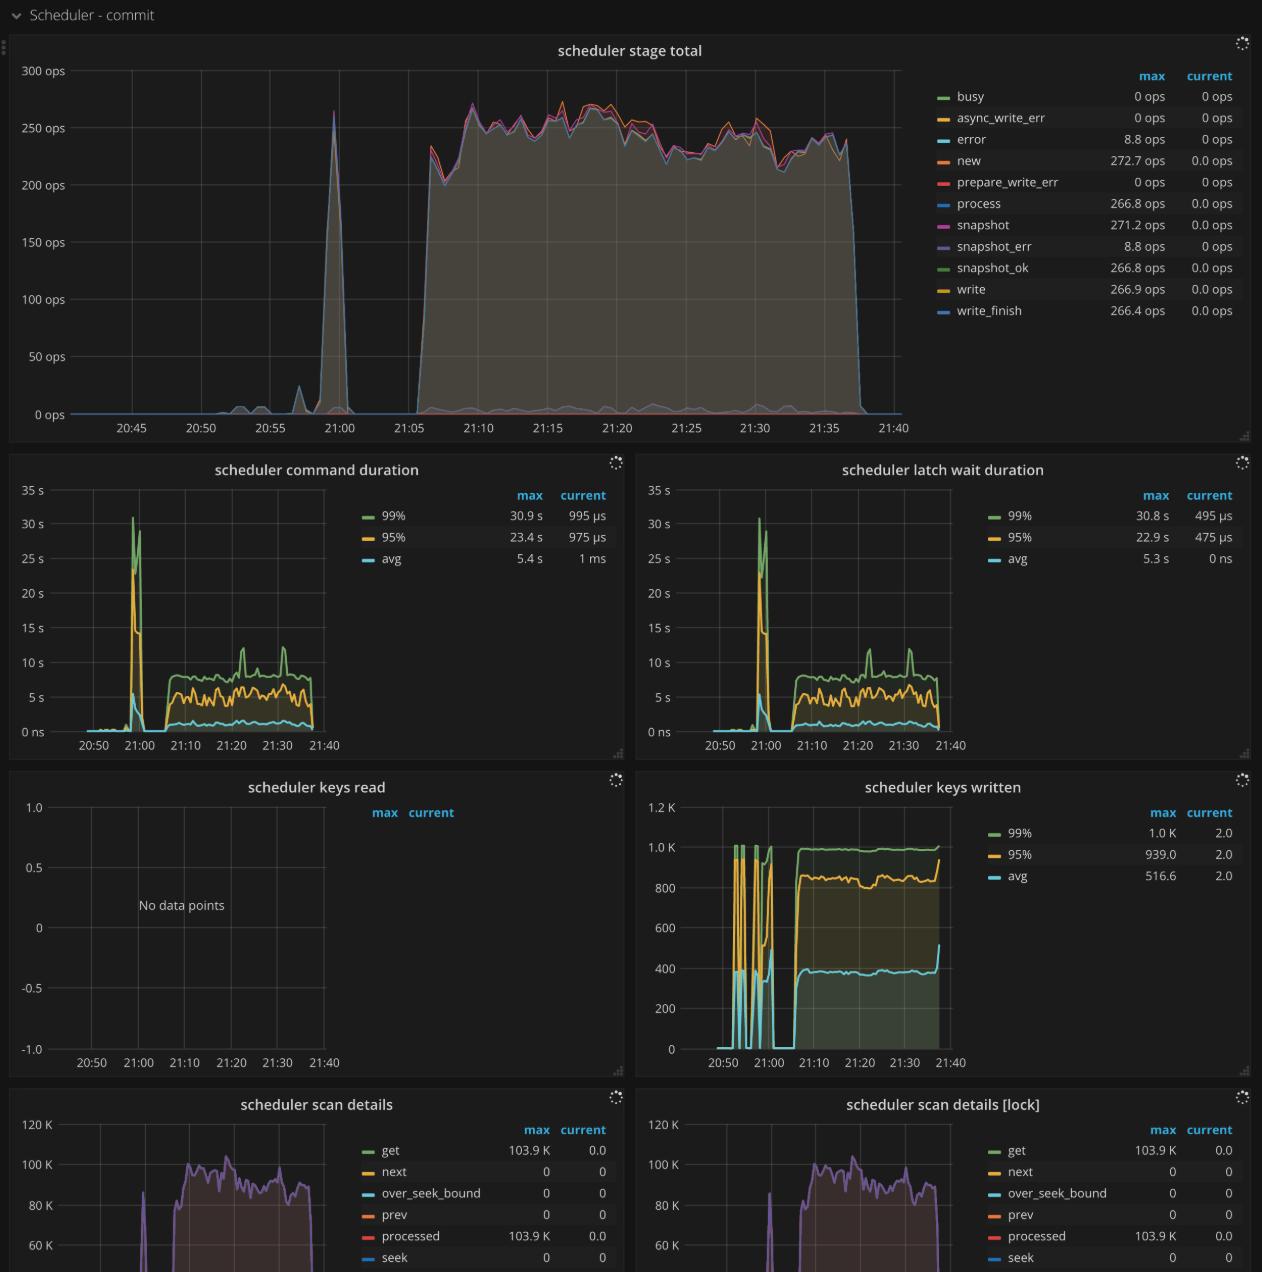 TiKV Dashboard - Scheduler commit metrics